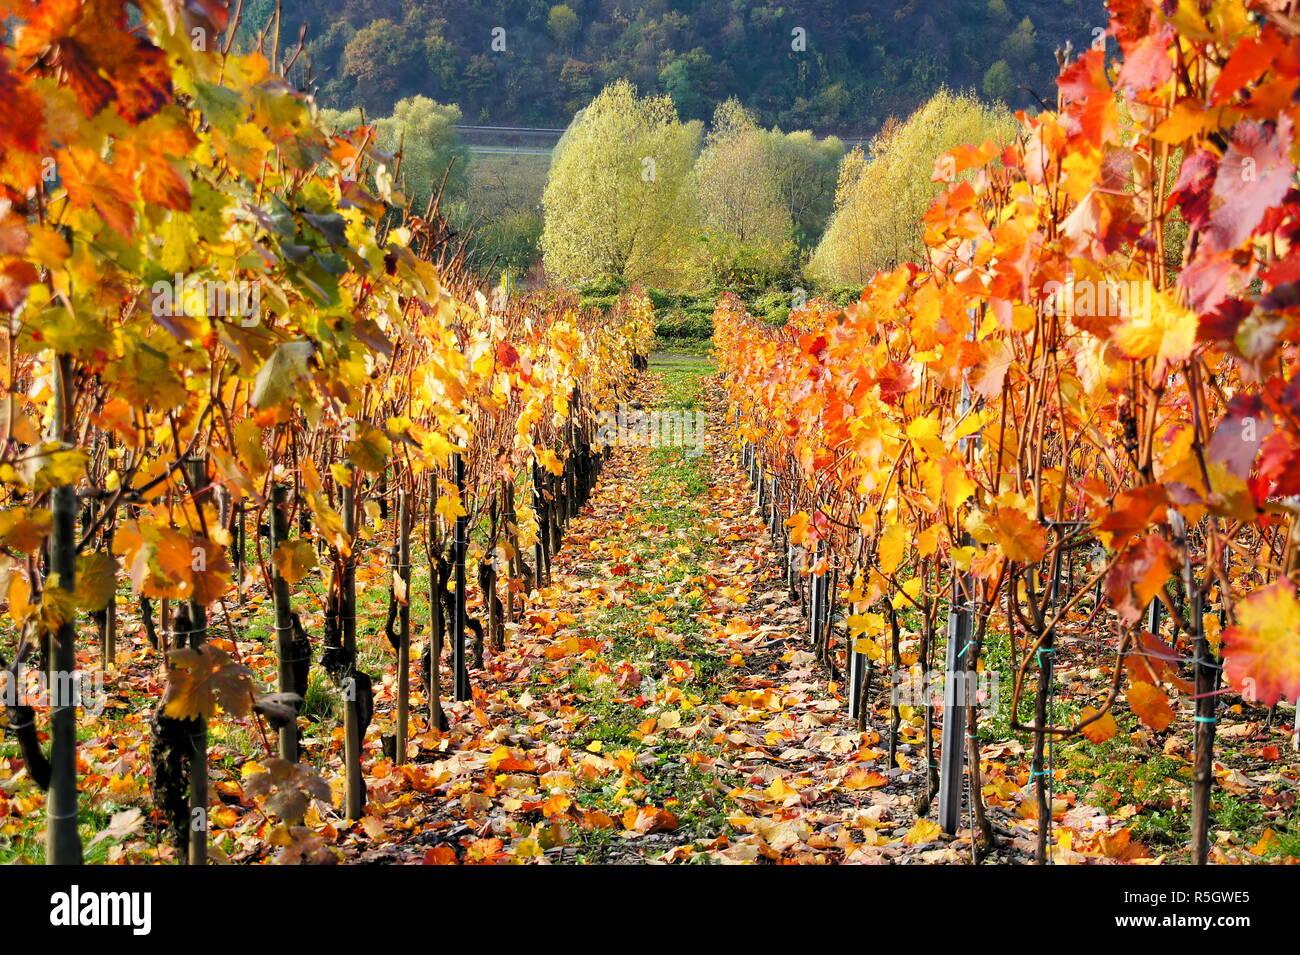 autumnal red wine grapesrn Stock Photo